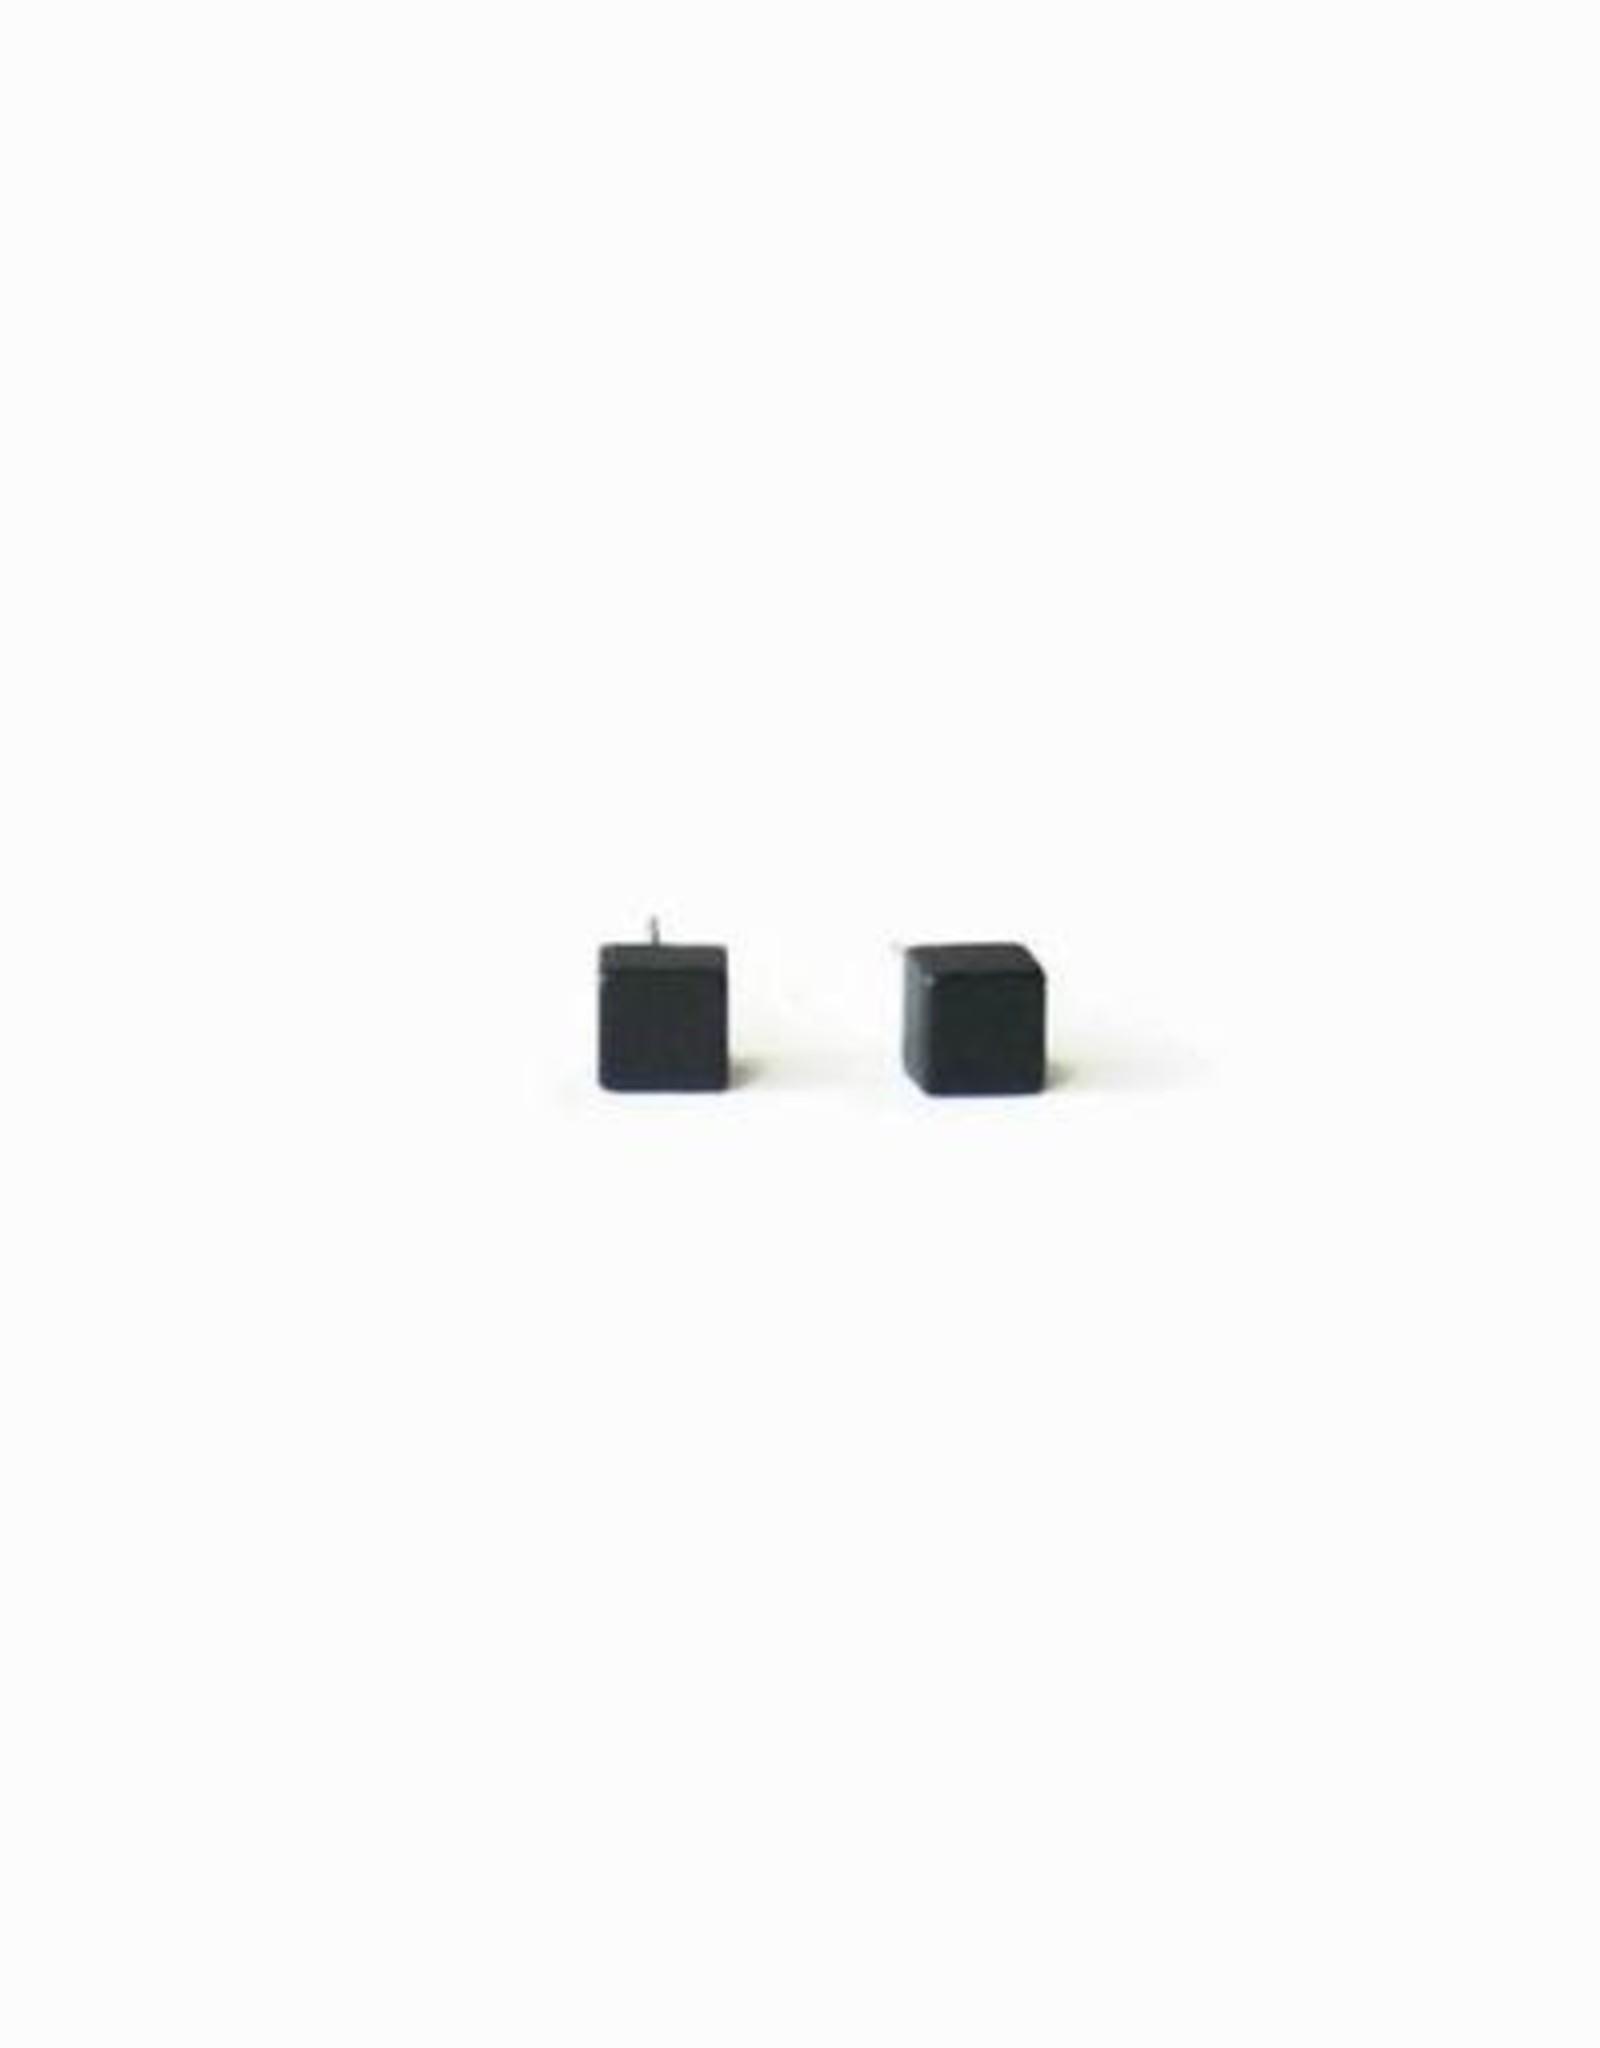 Simple Geometric Black Cube Stud Earrings